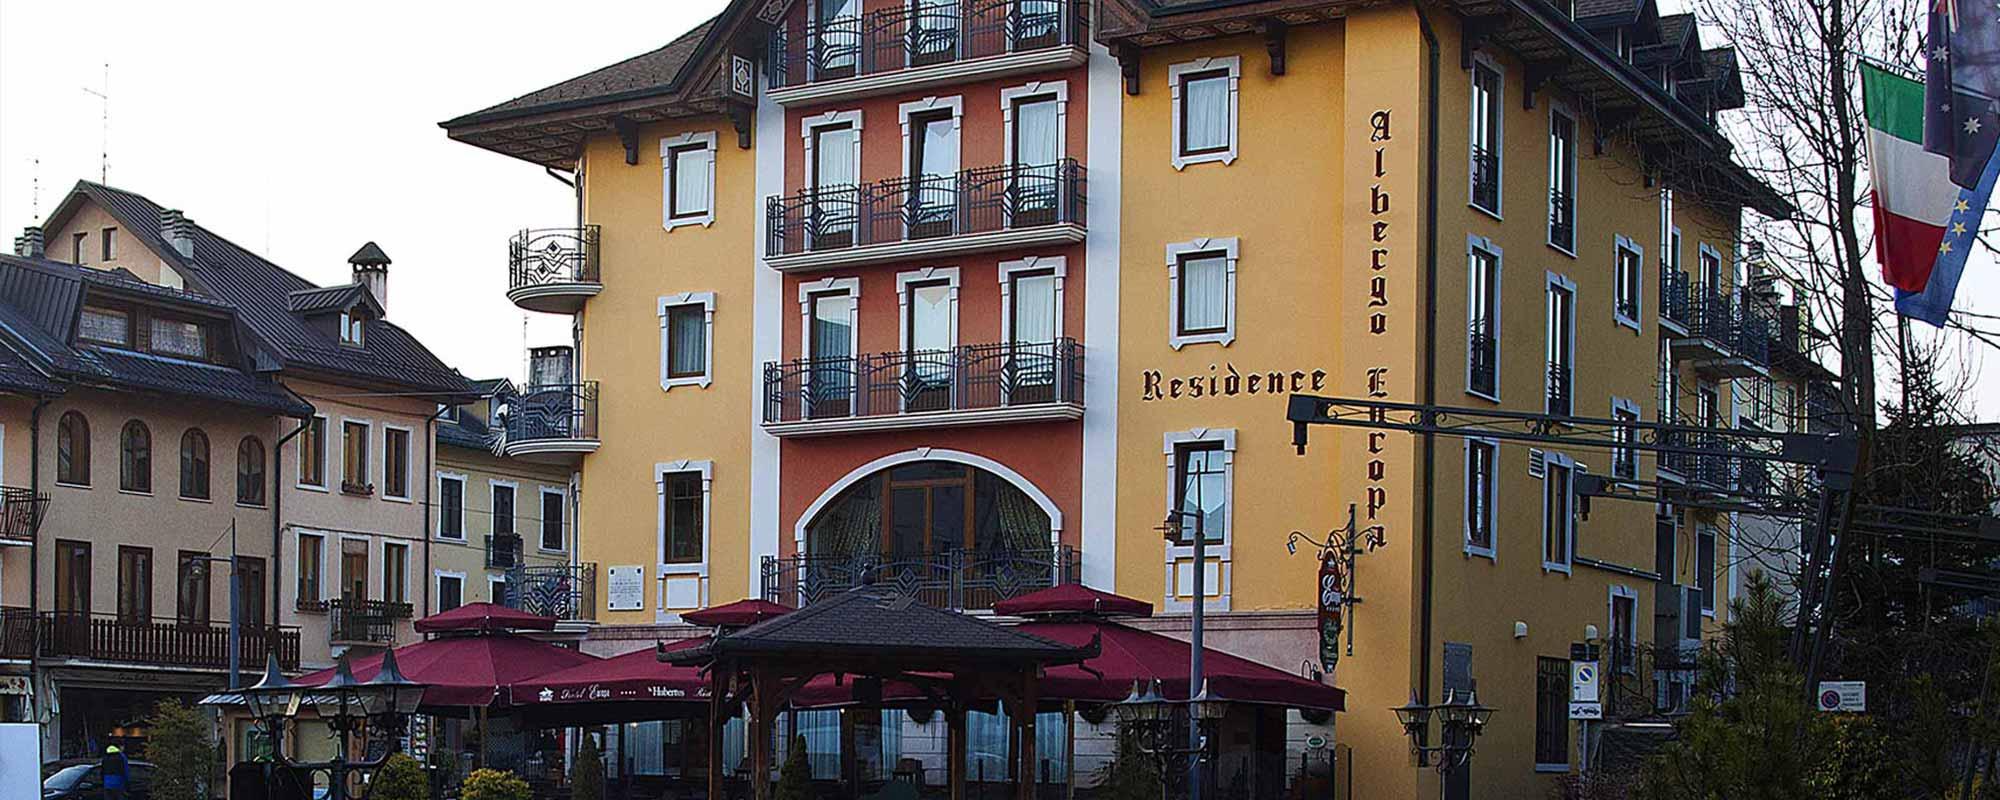 Hotel Europa Residence Asiago 4 Stars Superior Wellness Gourmet